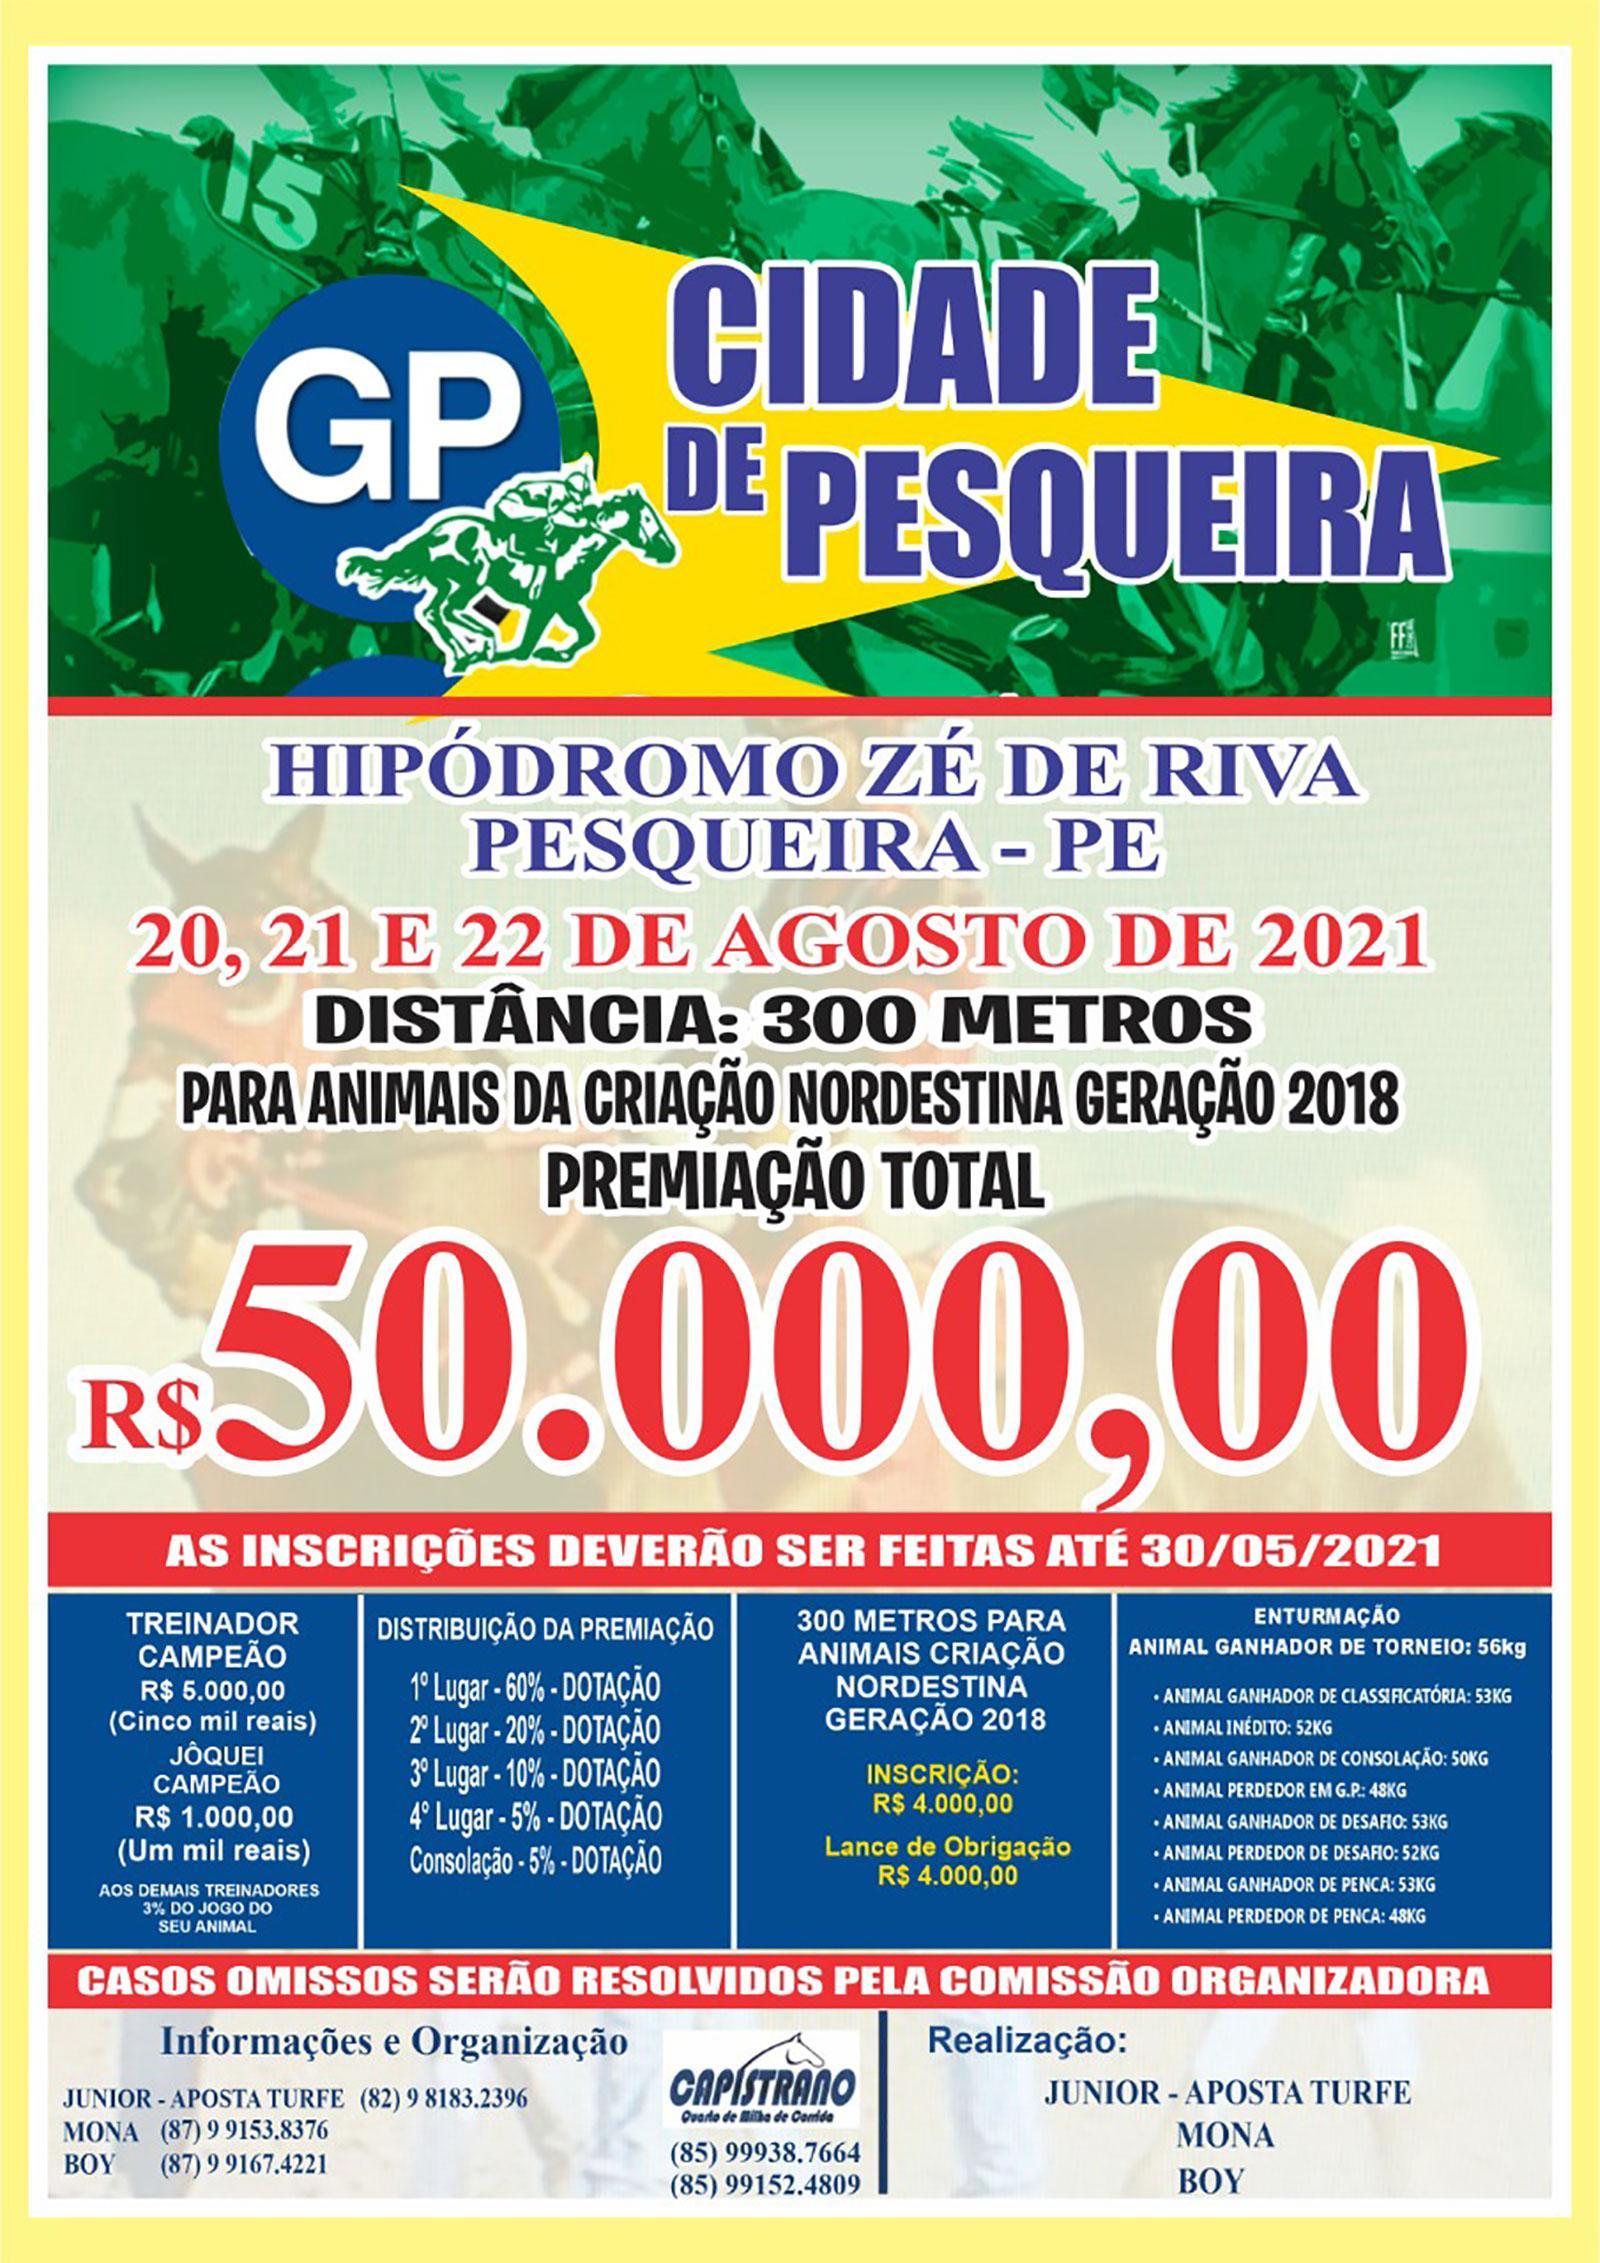 Grande Premio na cidade de Pesqueira -PE